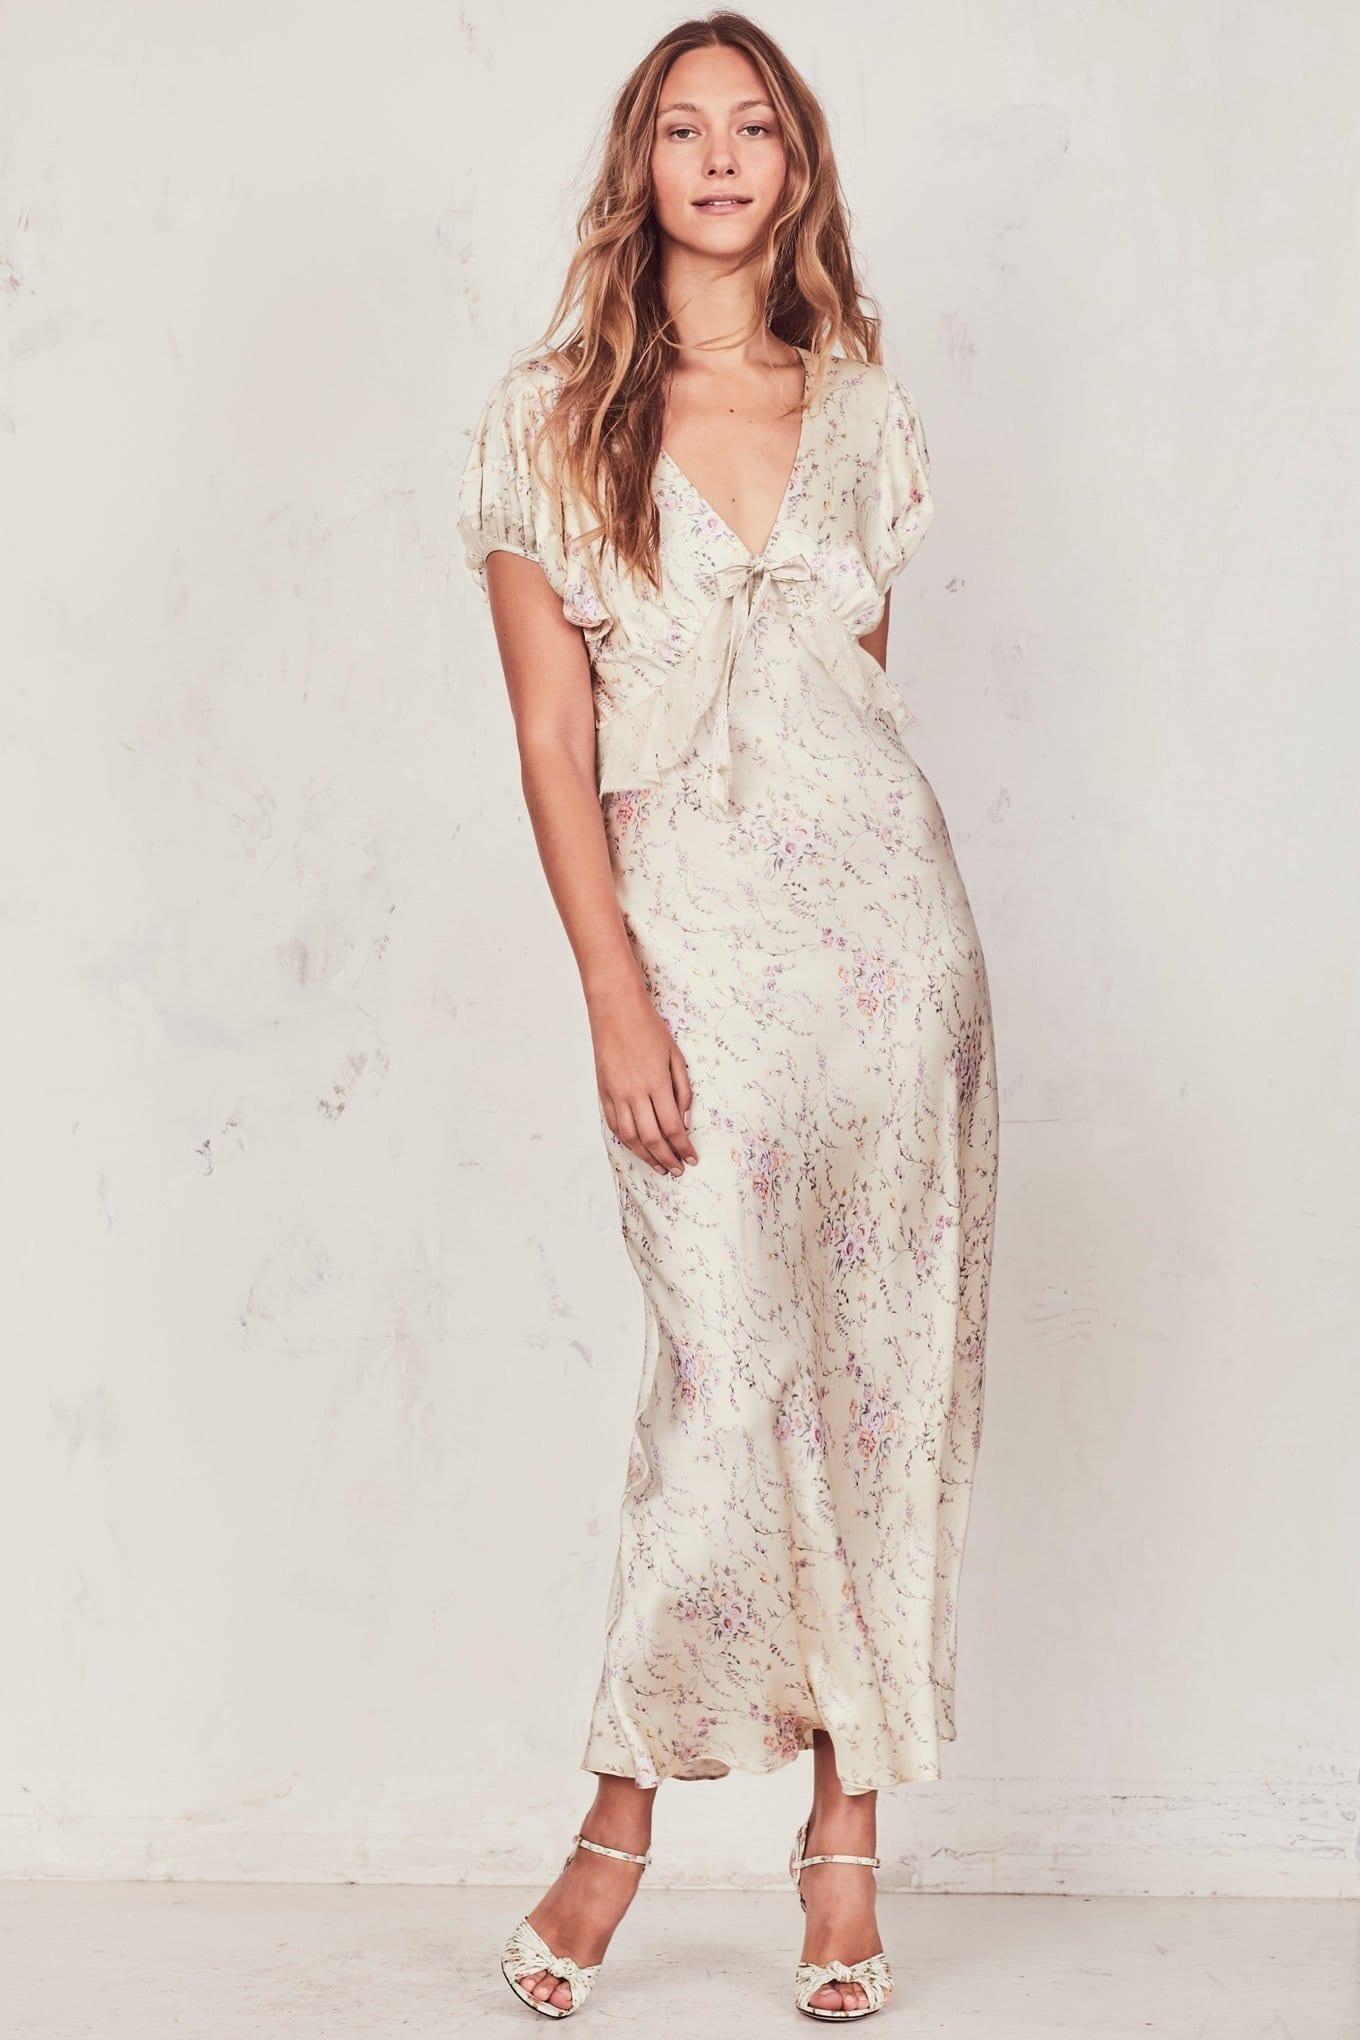 LOVESHACKFANCY Lillian Biscotti / Floral Printed Dress